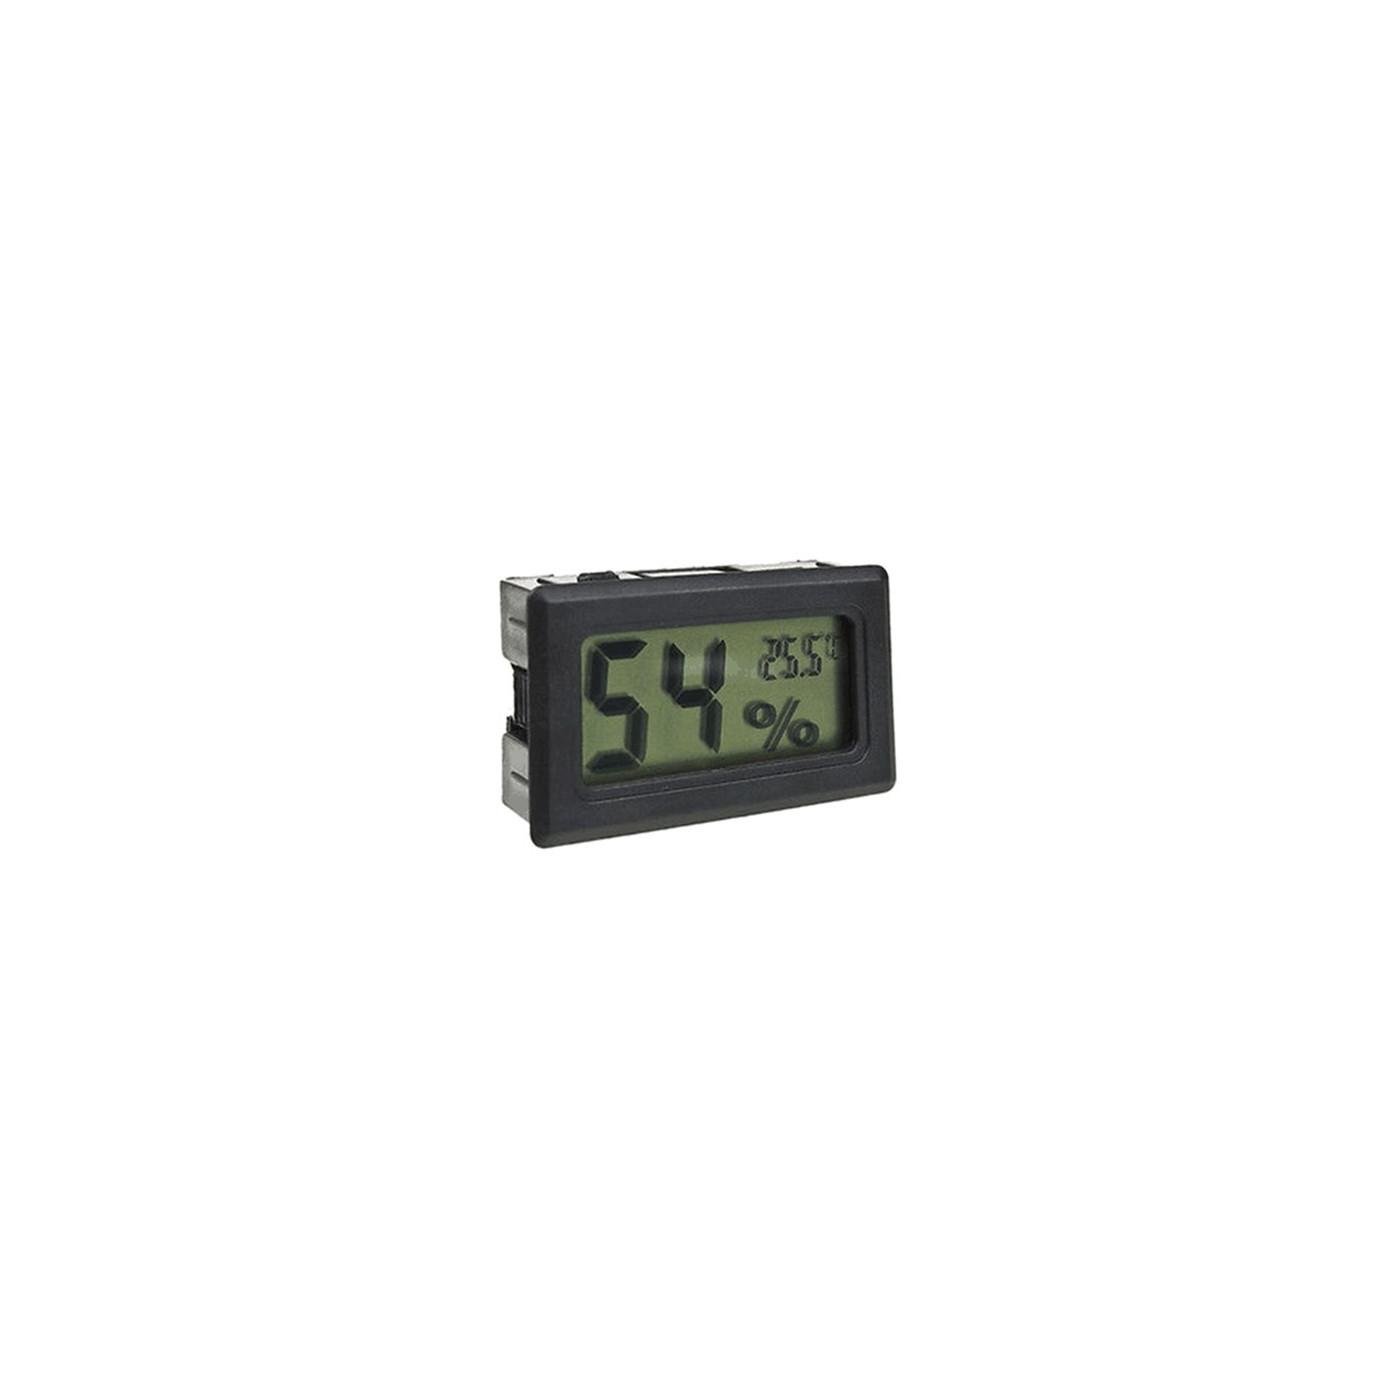 Medidor de temperatura e umidade interno de LCD (preto)  - 1